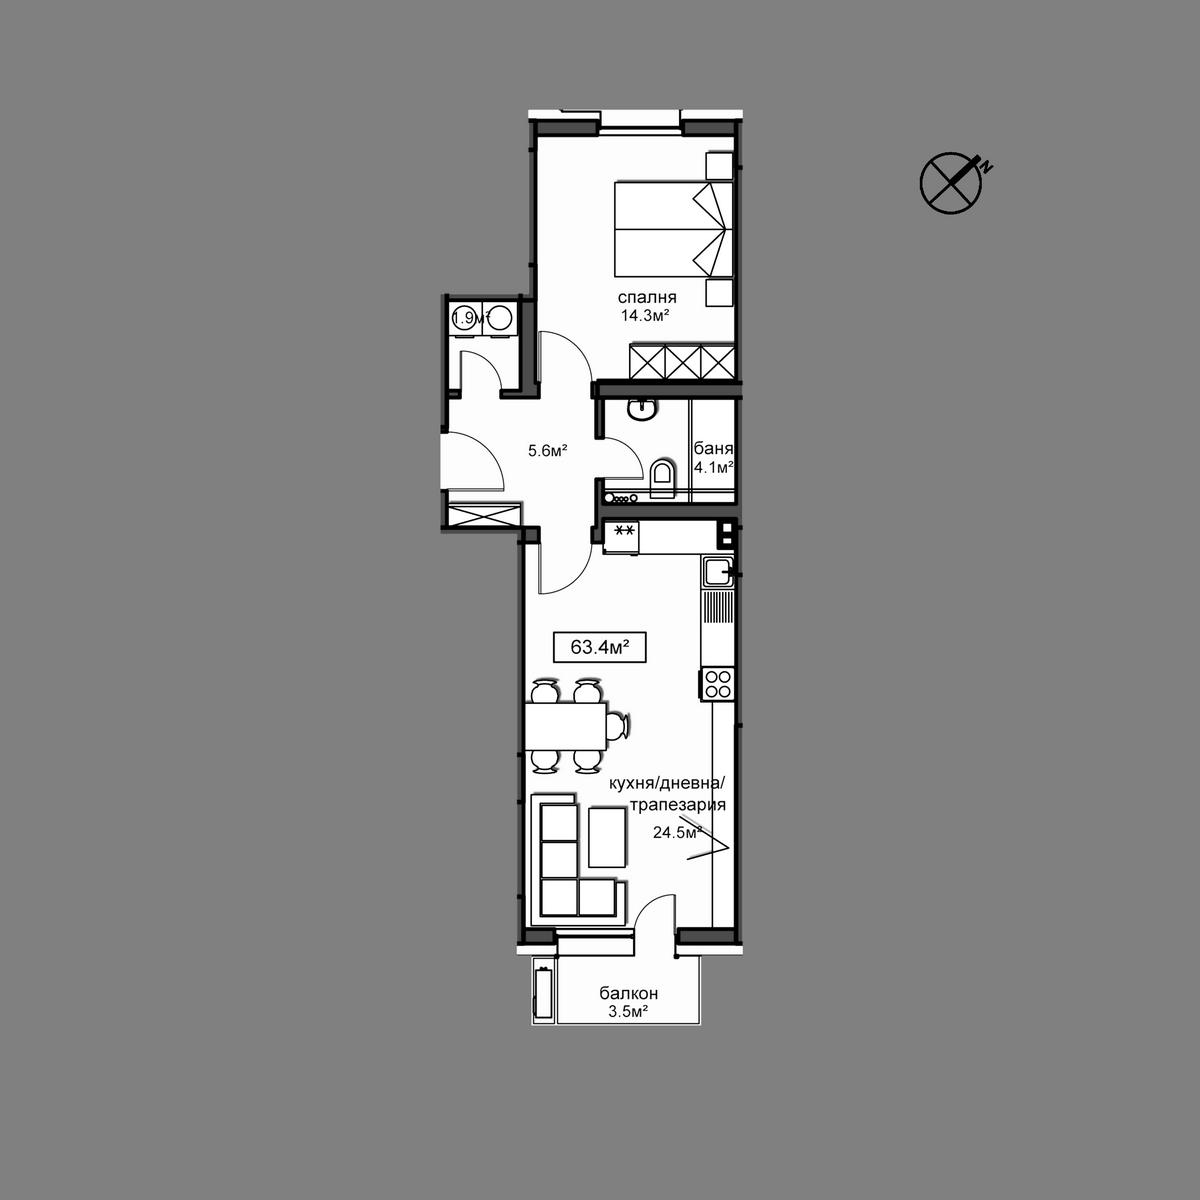 Продава апартамент ново строителство - Апартамент А15